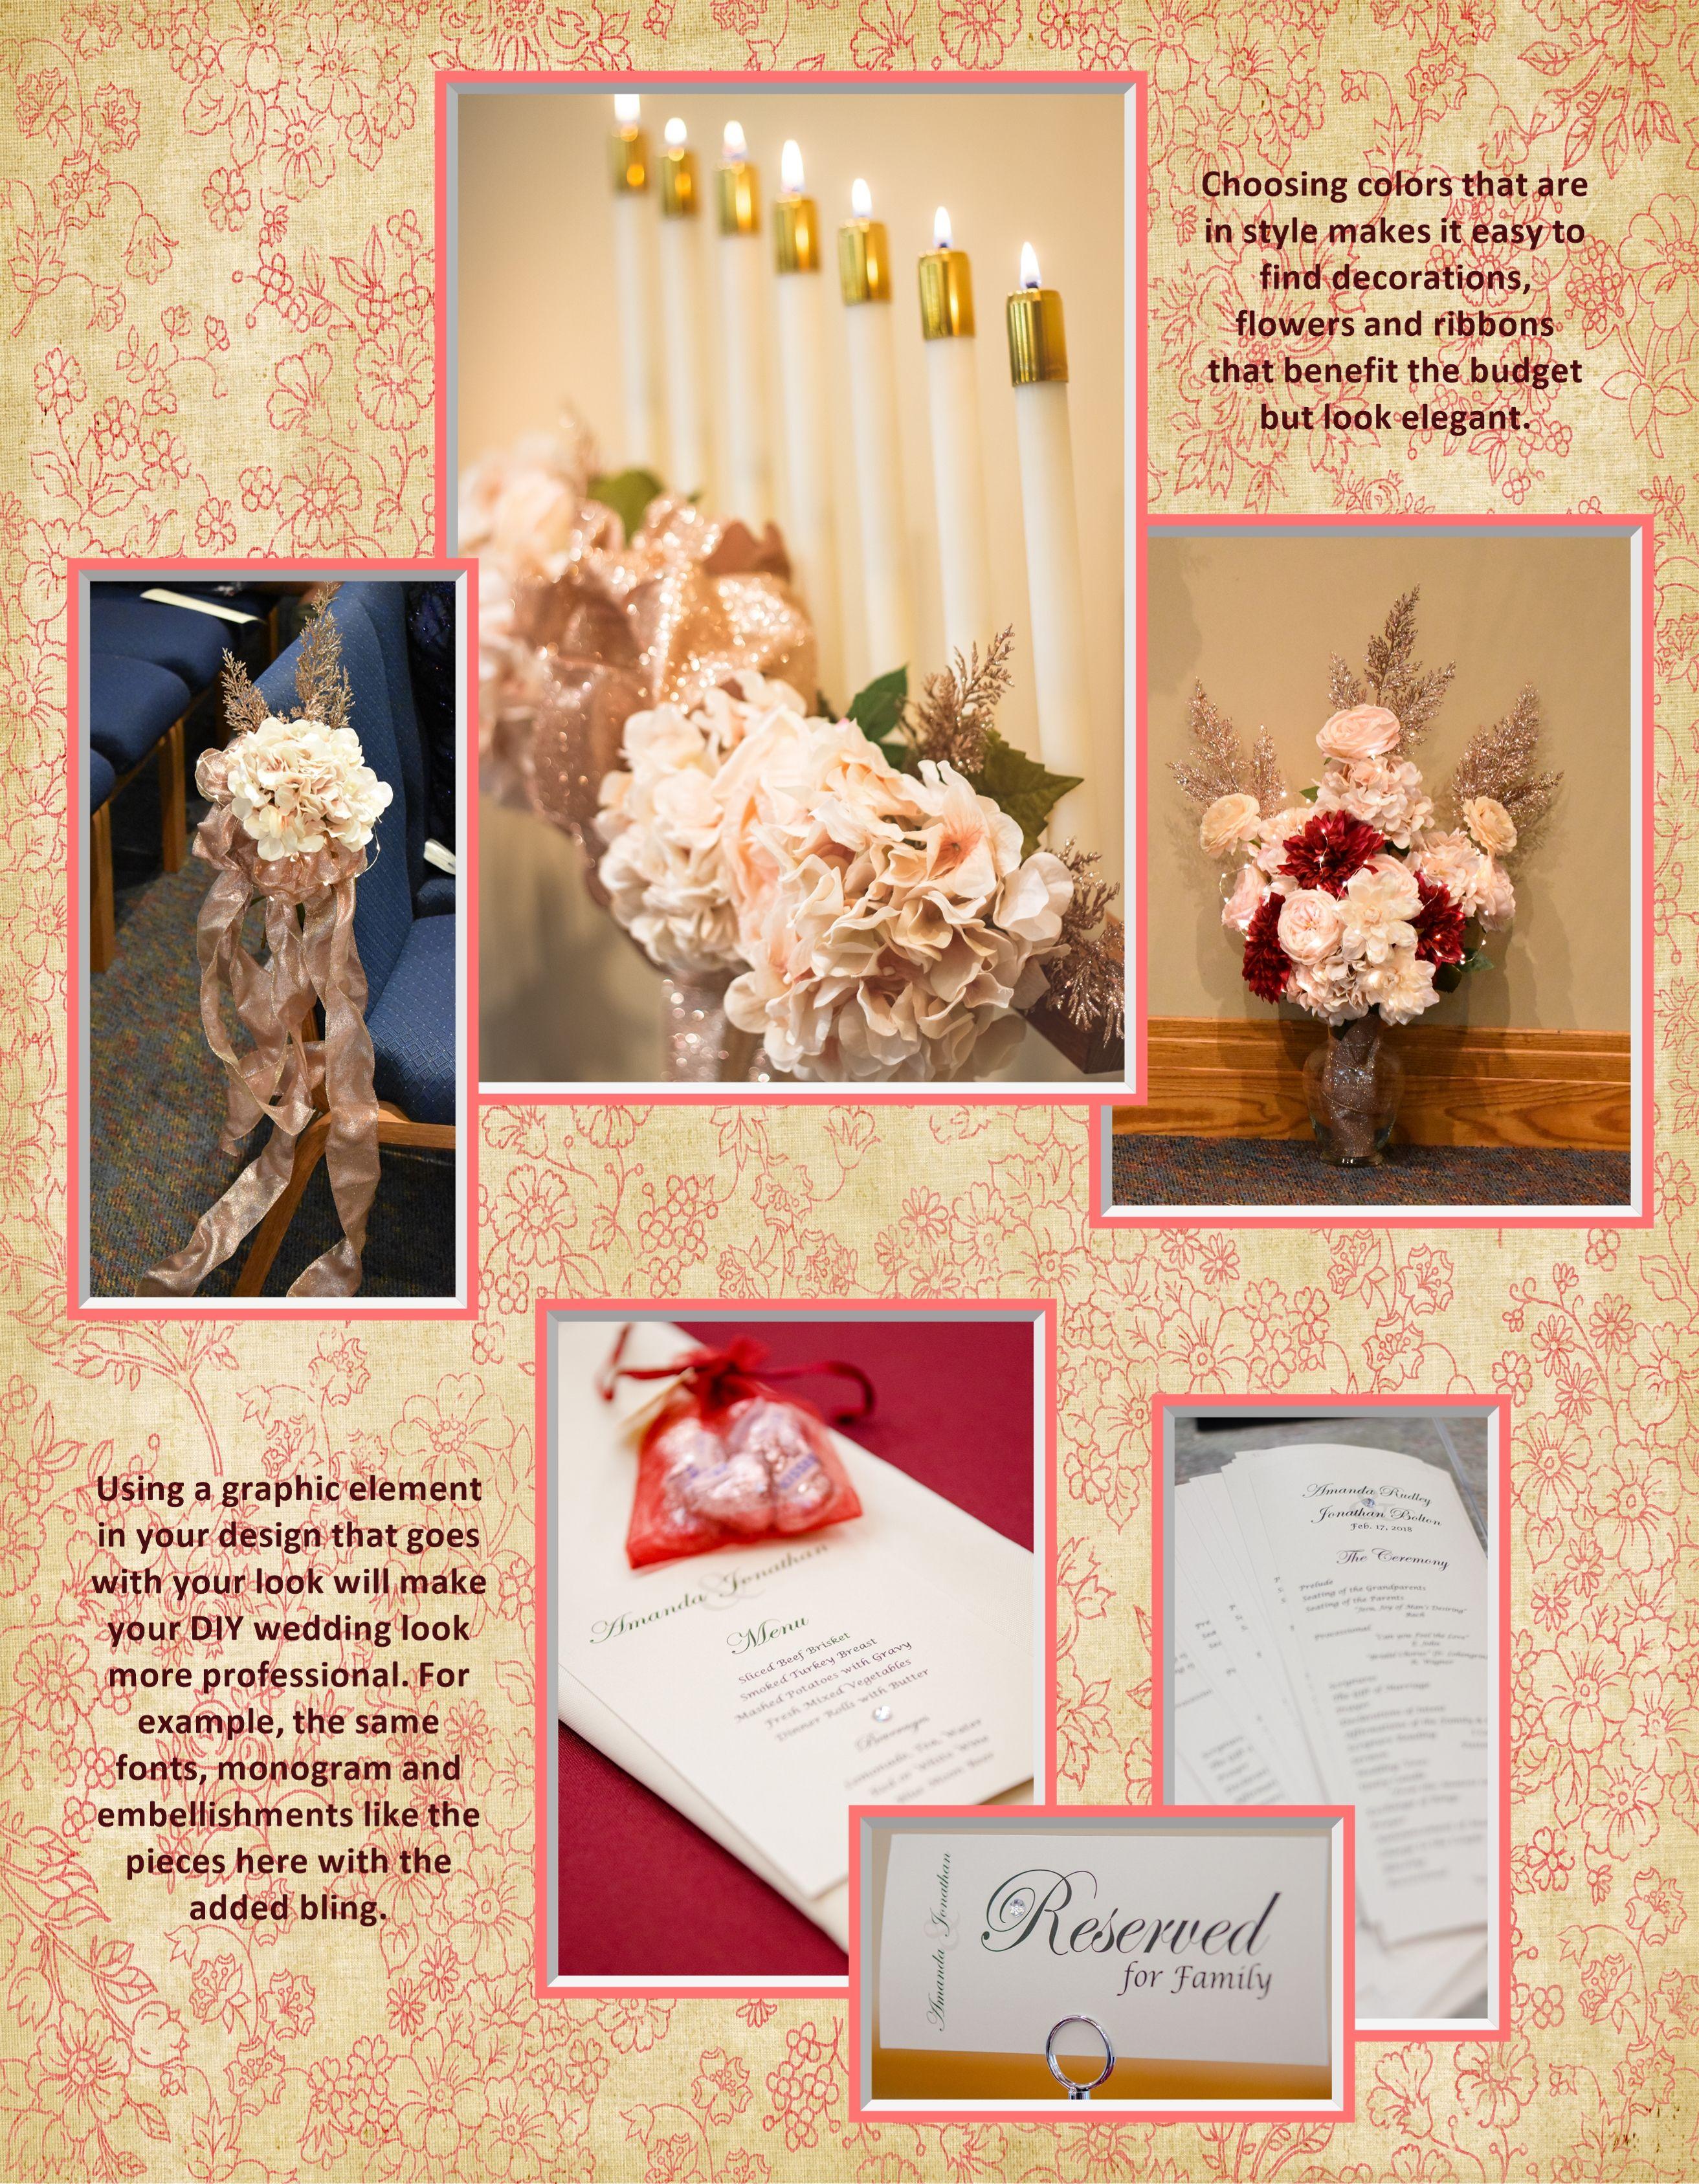 Jonathan & Amanda's details | Diy wedding, Wedding book, Wedding looks